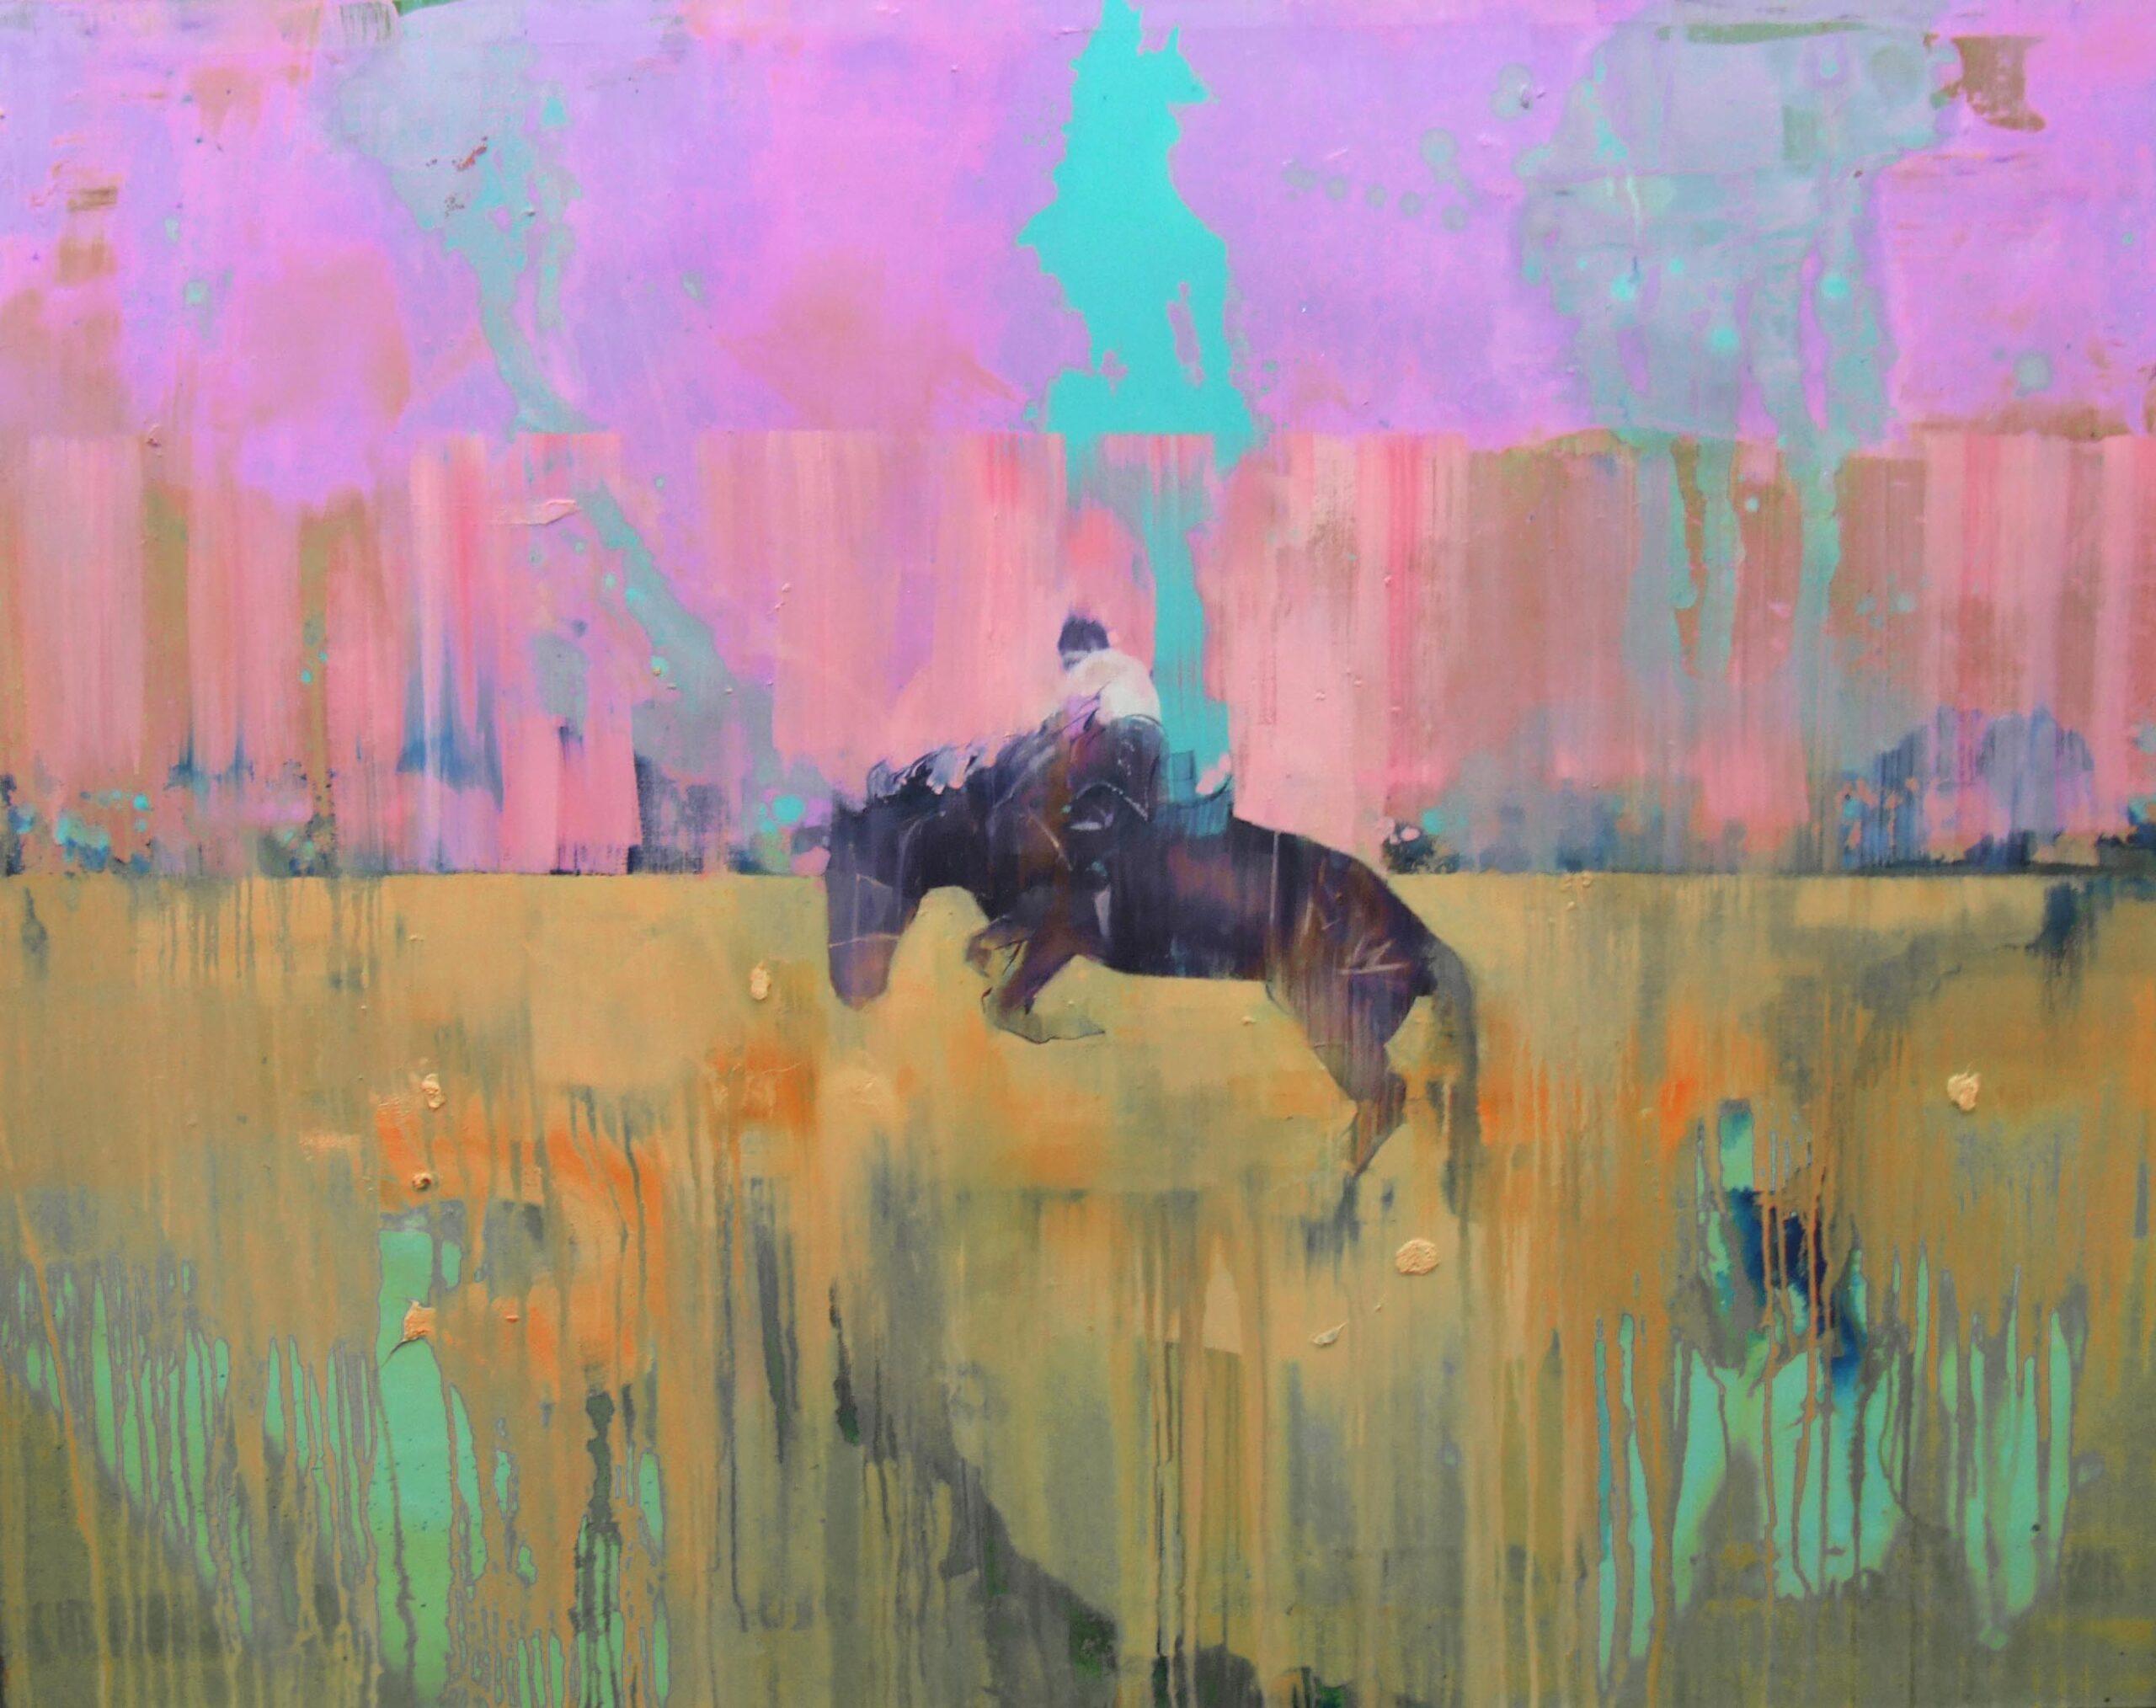 Cowboy 130 x 150 cm oil on canvas